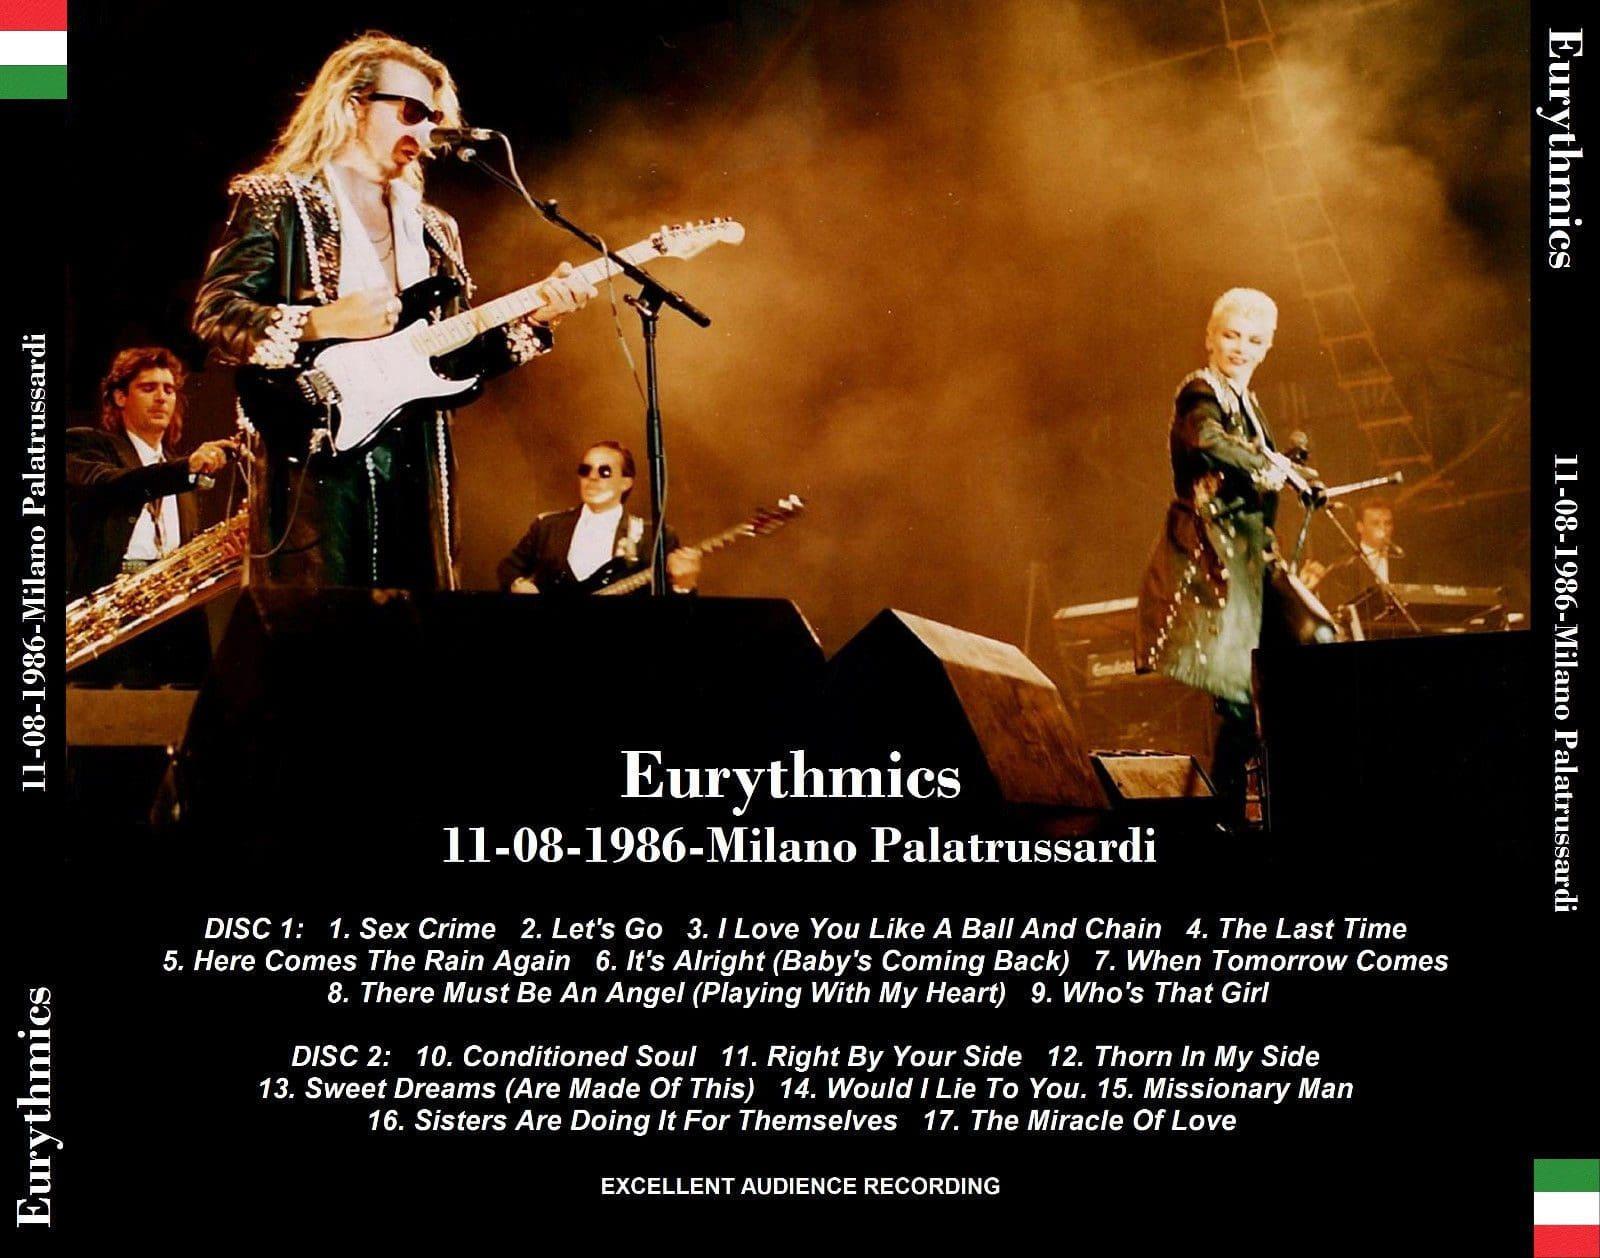 5086 Eurythmics Bootlegs The Revenge Tour UK CD 03 - Ultimate